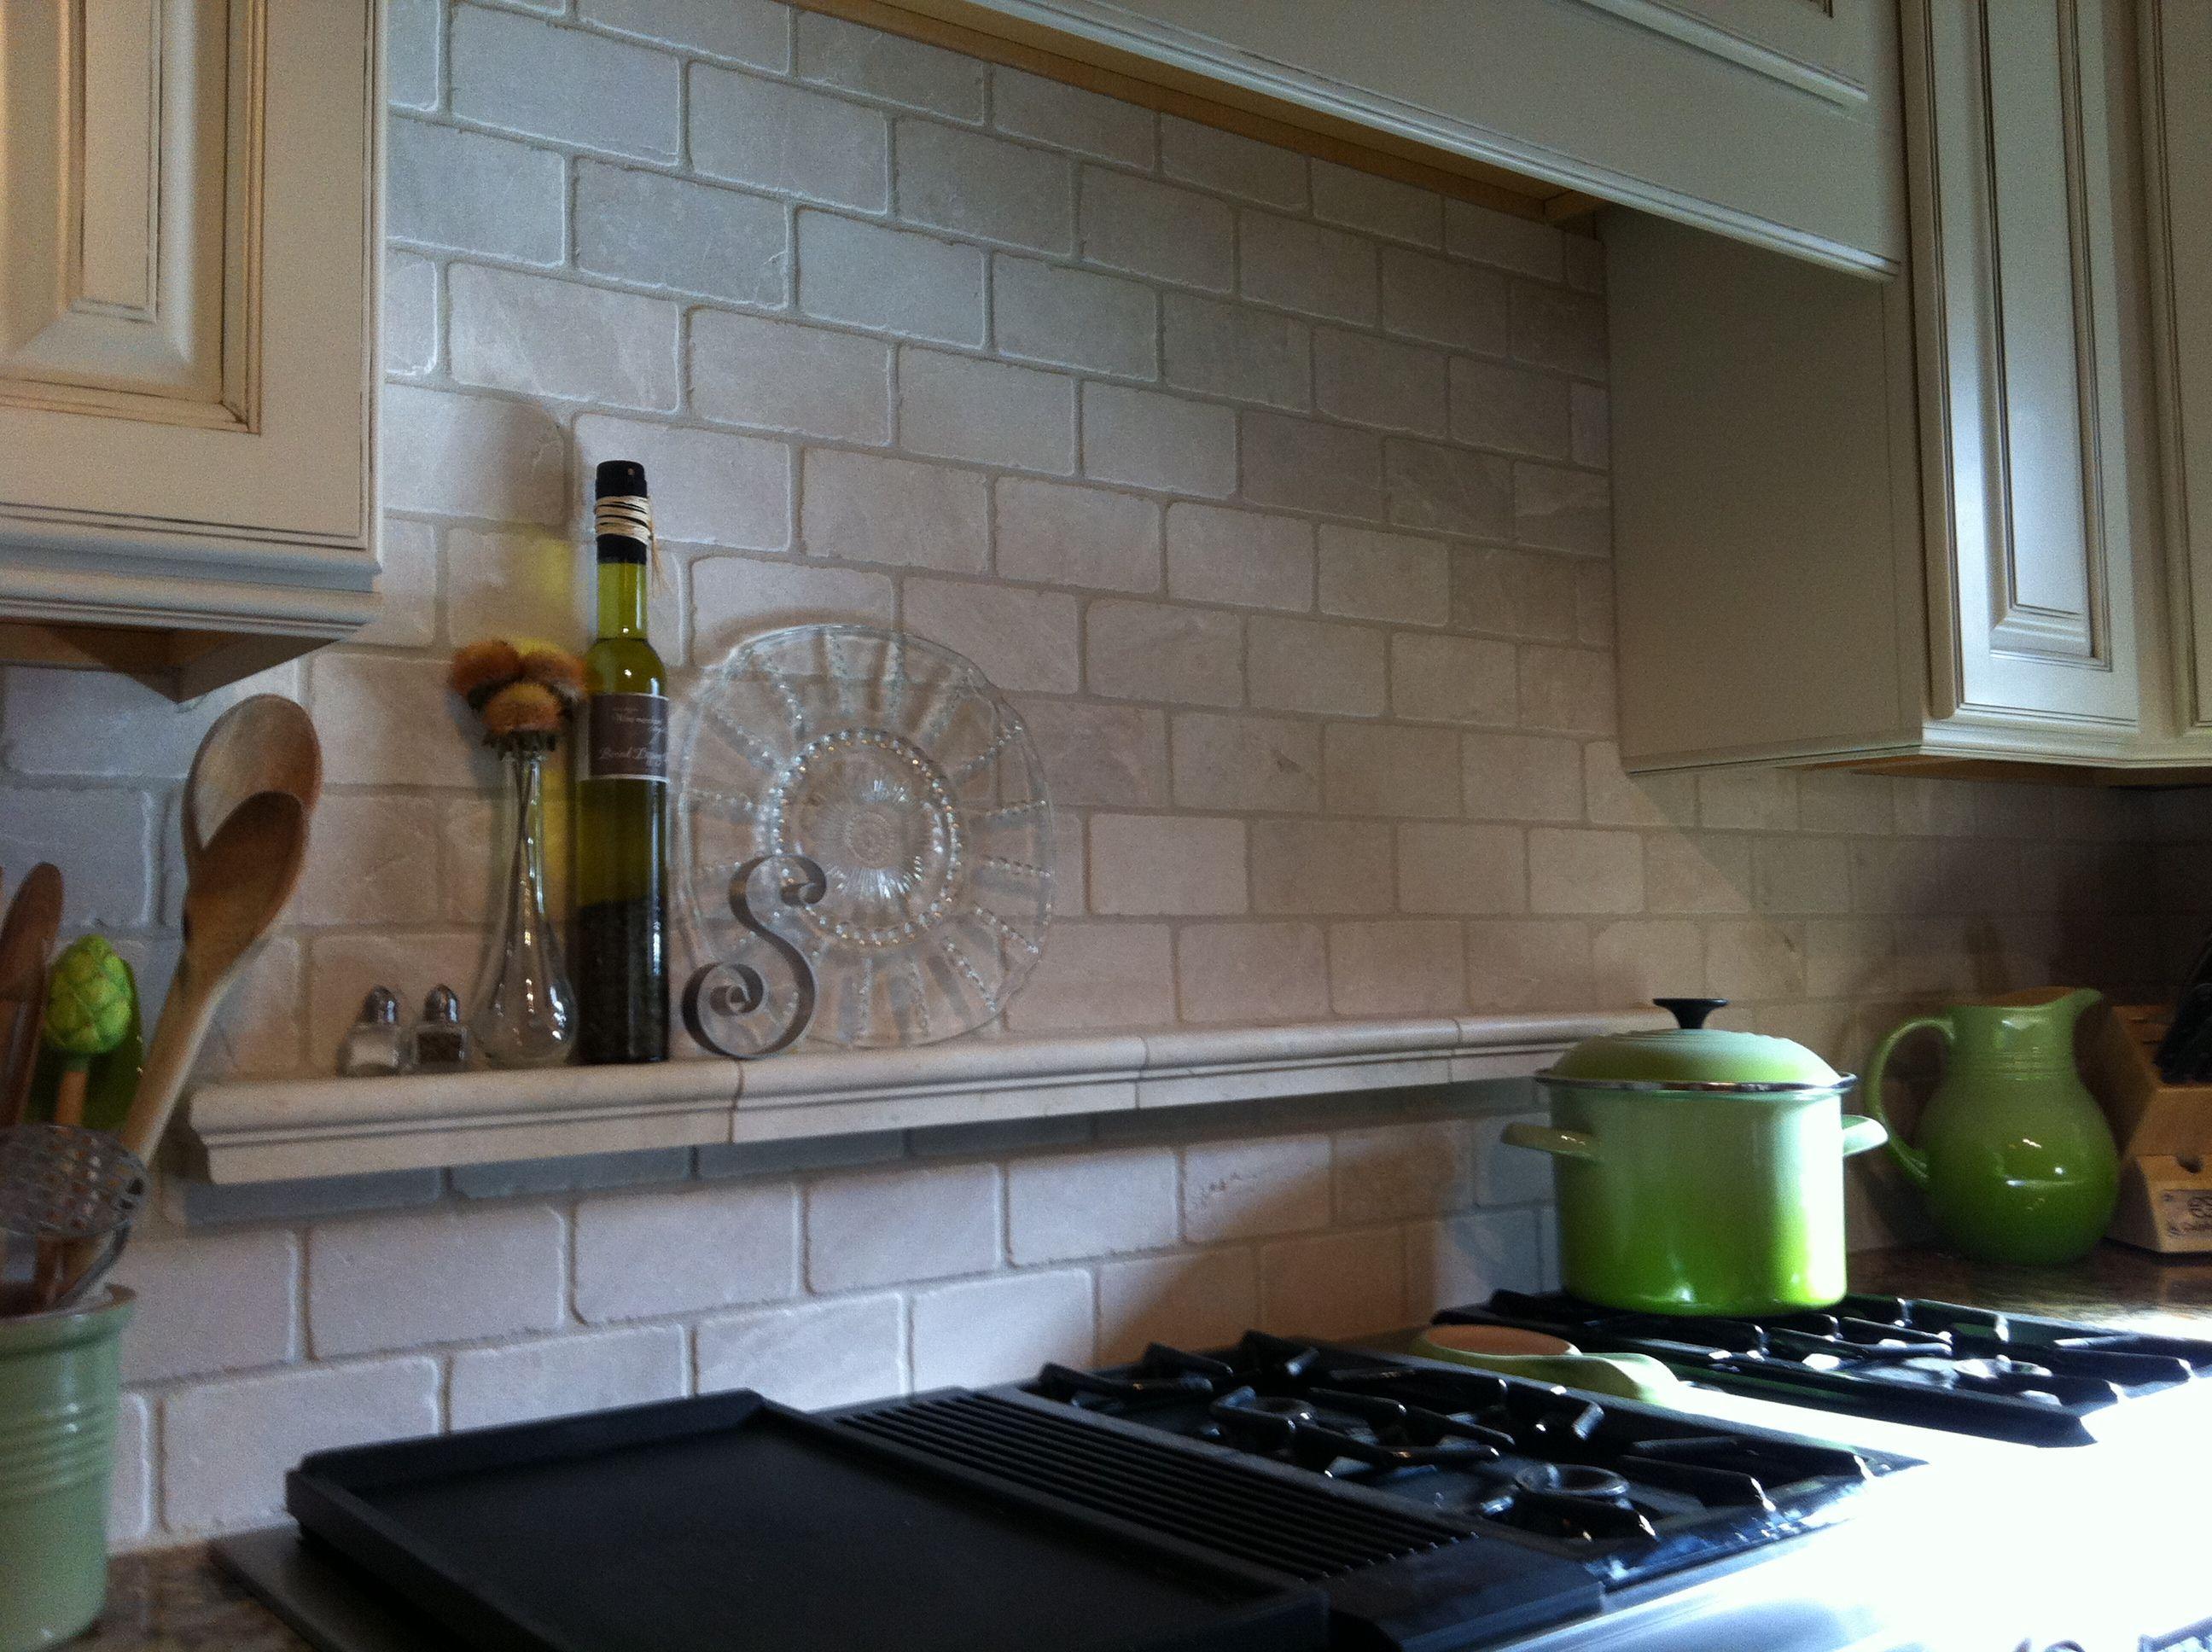 Kitchen Backsplash Shelves tile shelf behind stove | for the home | pinterest | stove